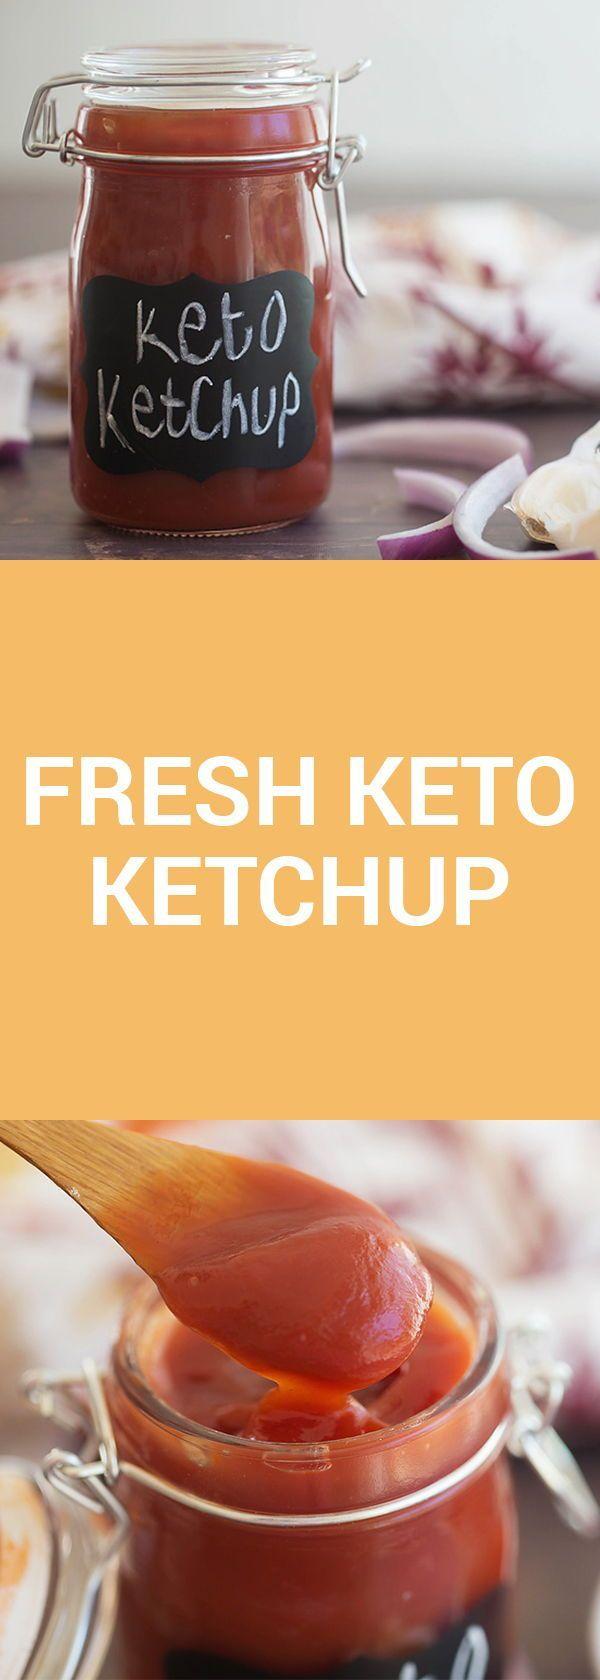 Fresh Keto Ketchup   Keto Diet Suplement 4